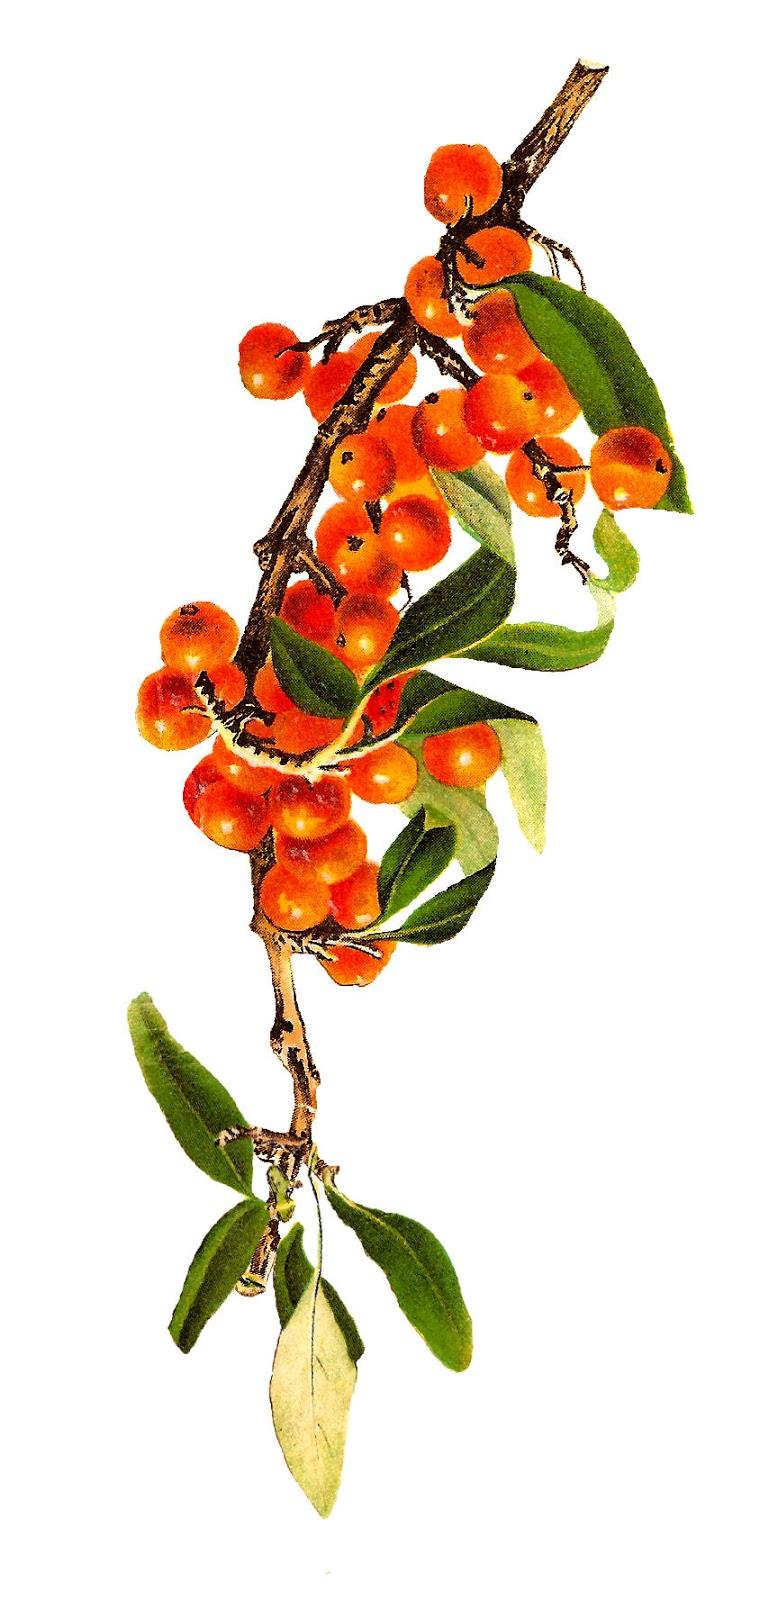 Antique Images: Antique Fruit Illustrations Strawberry Rowan Berry.